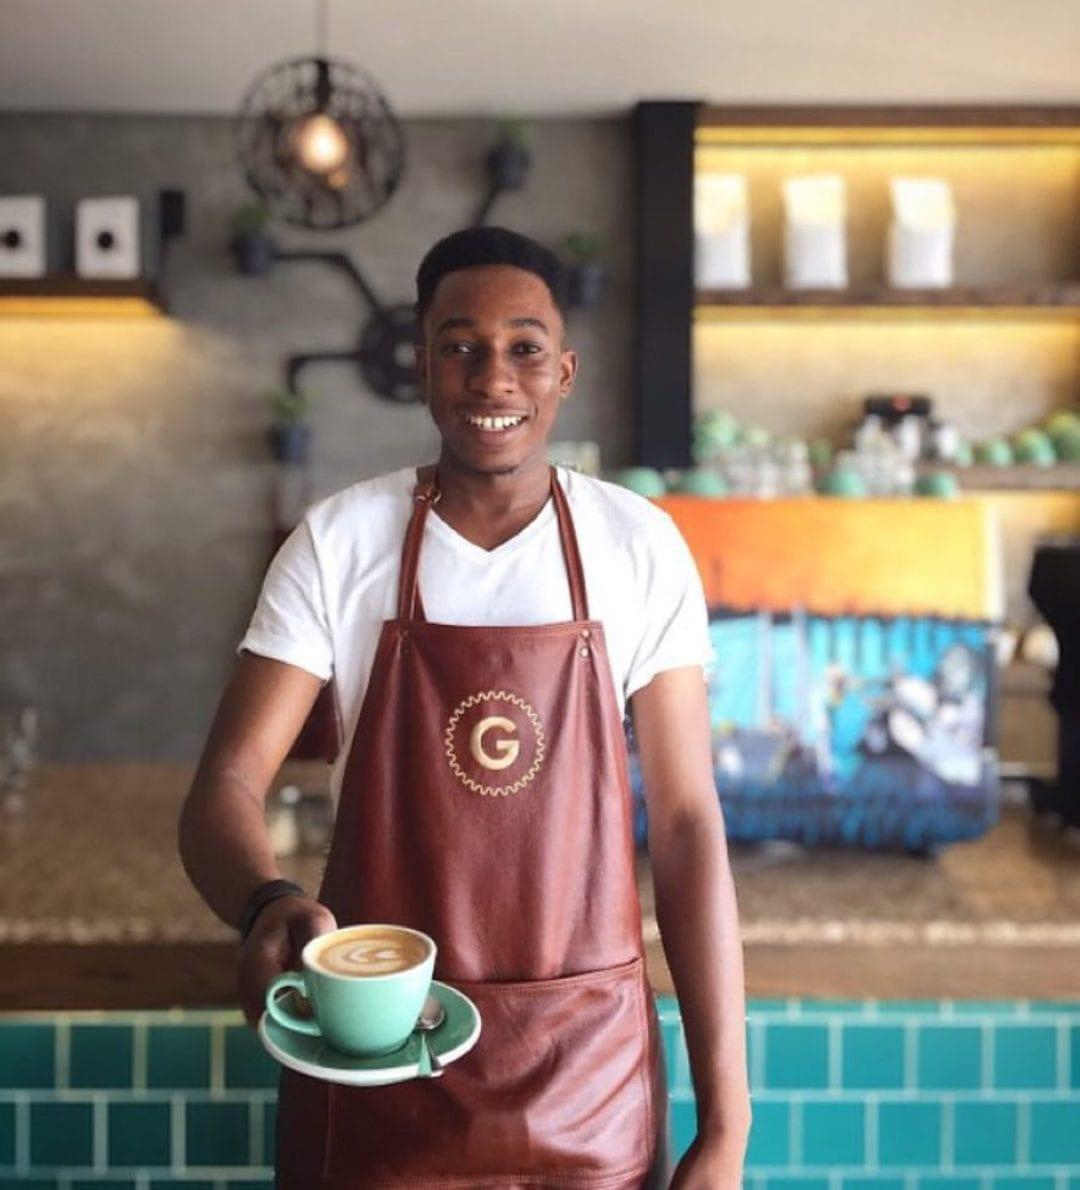 barista sirviendo cafe